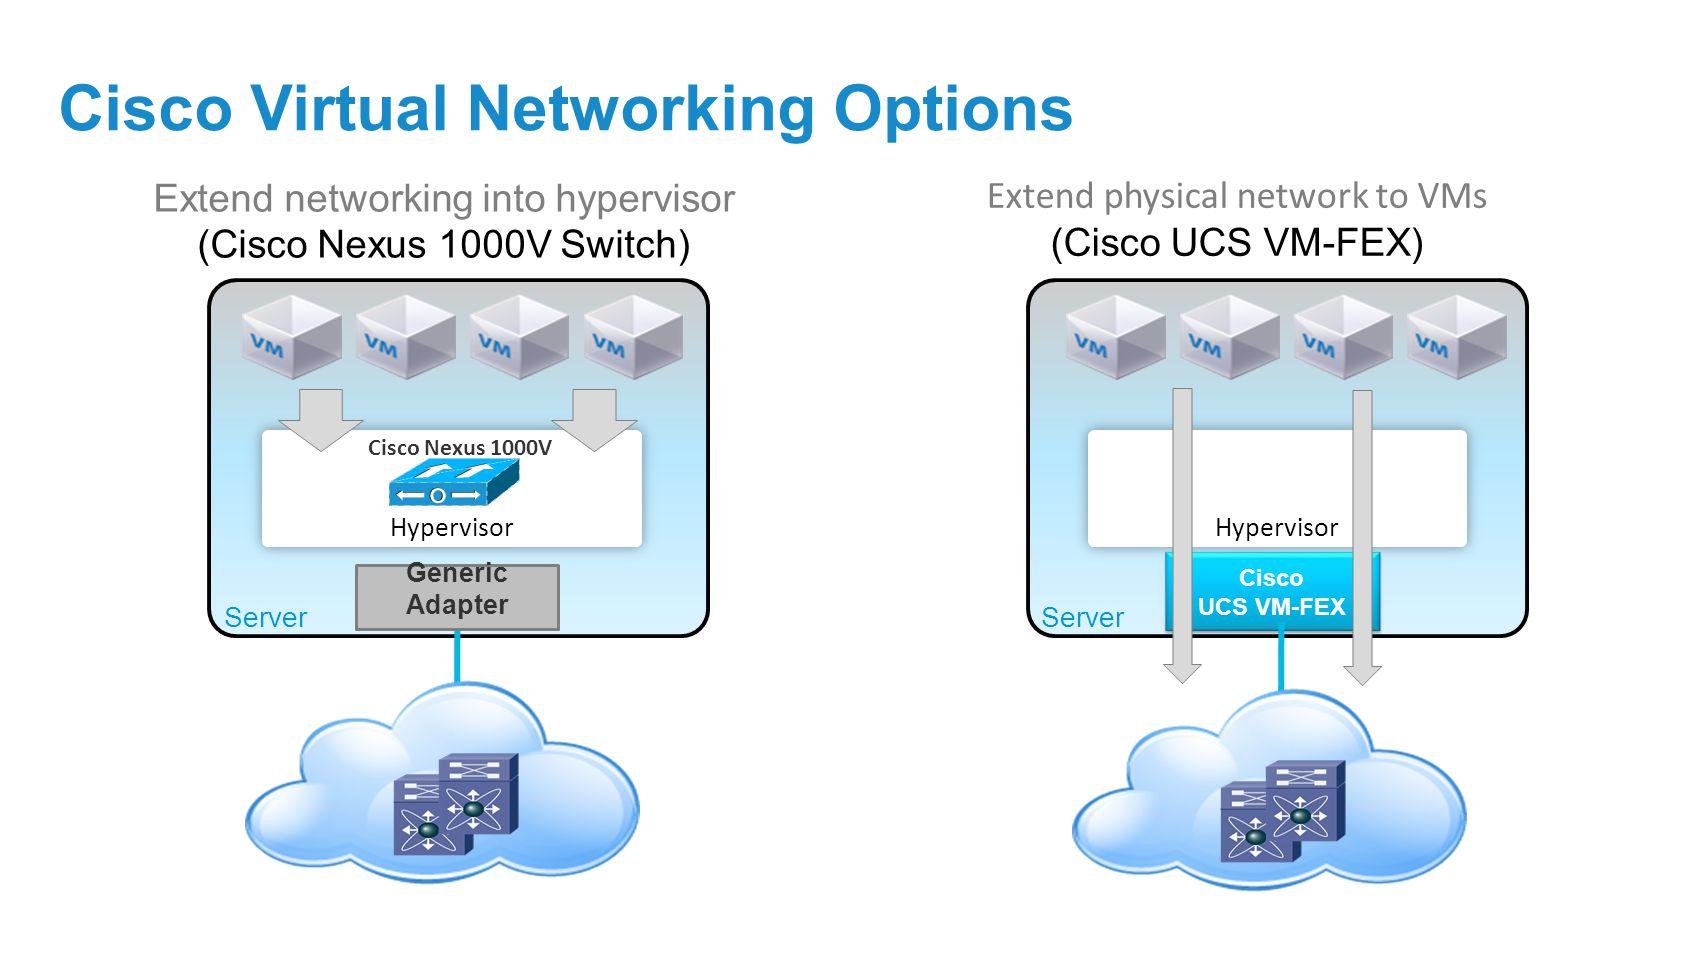 Cisco Virtual Networking Options Extend networking into hypervisor (Cisco Nexus 1000V Switch) Cisco UCS VM-FEX Cisco UCS VM-FEX Server Extend physical network to VMs (Cisco UCS VM-FEX) Hypervisor Cisco Nexus 1000V Generic Adapter Server